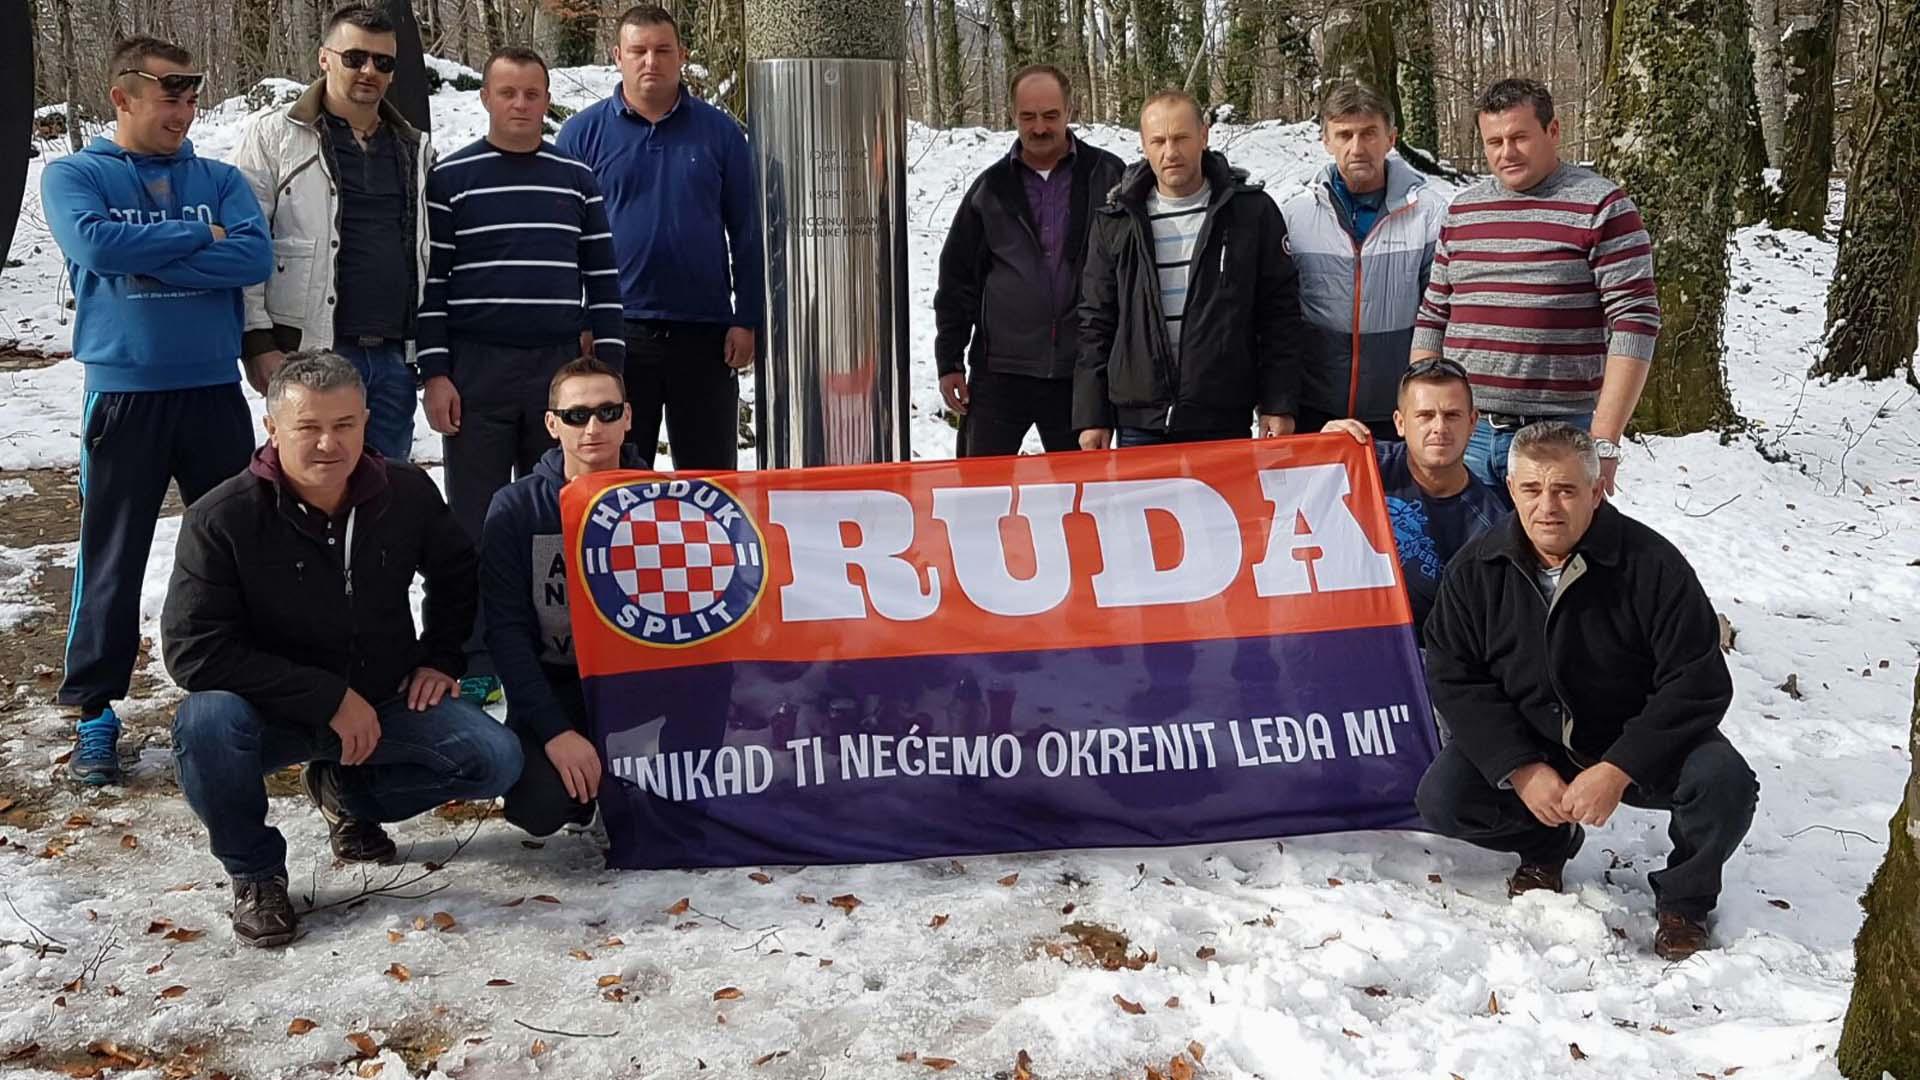 Ruda mislima uz Vukovar